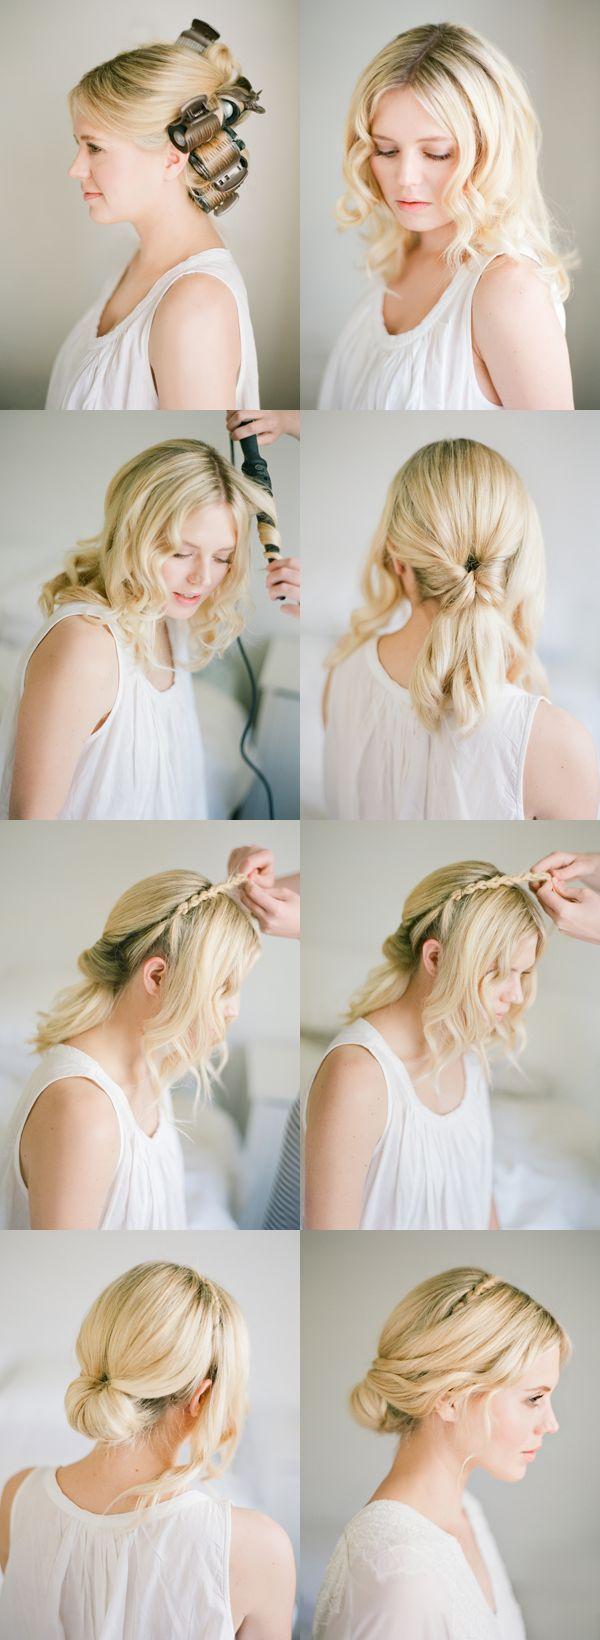 DIY Low Twisted Bun | Wedding Hair | Pinterest | Hair ...